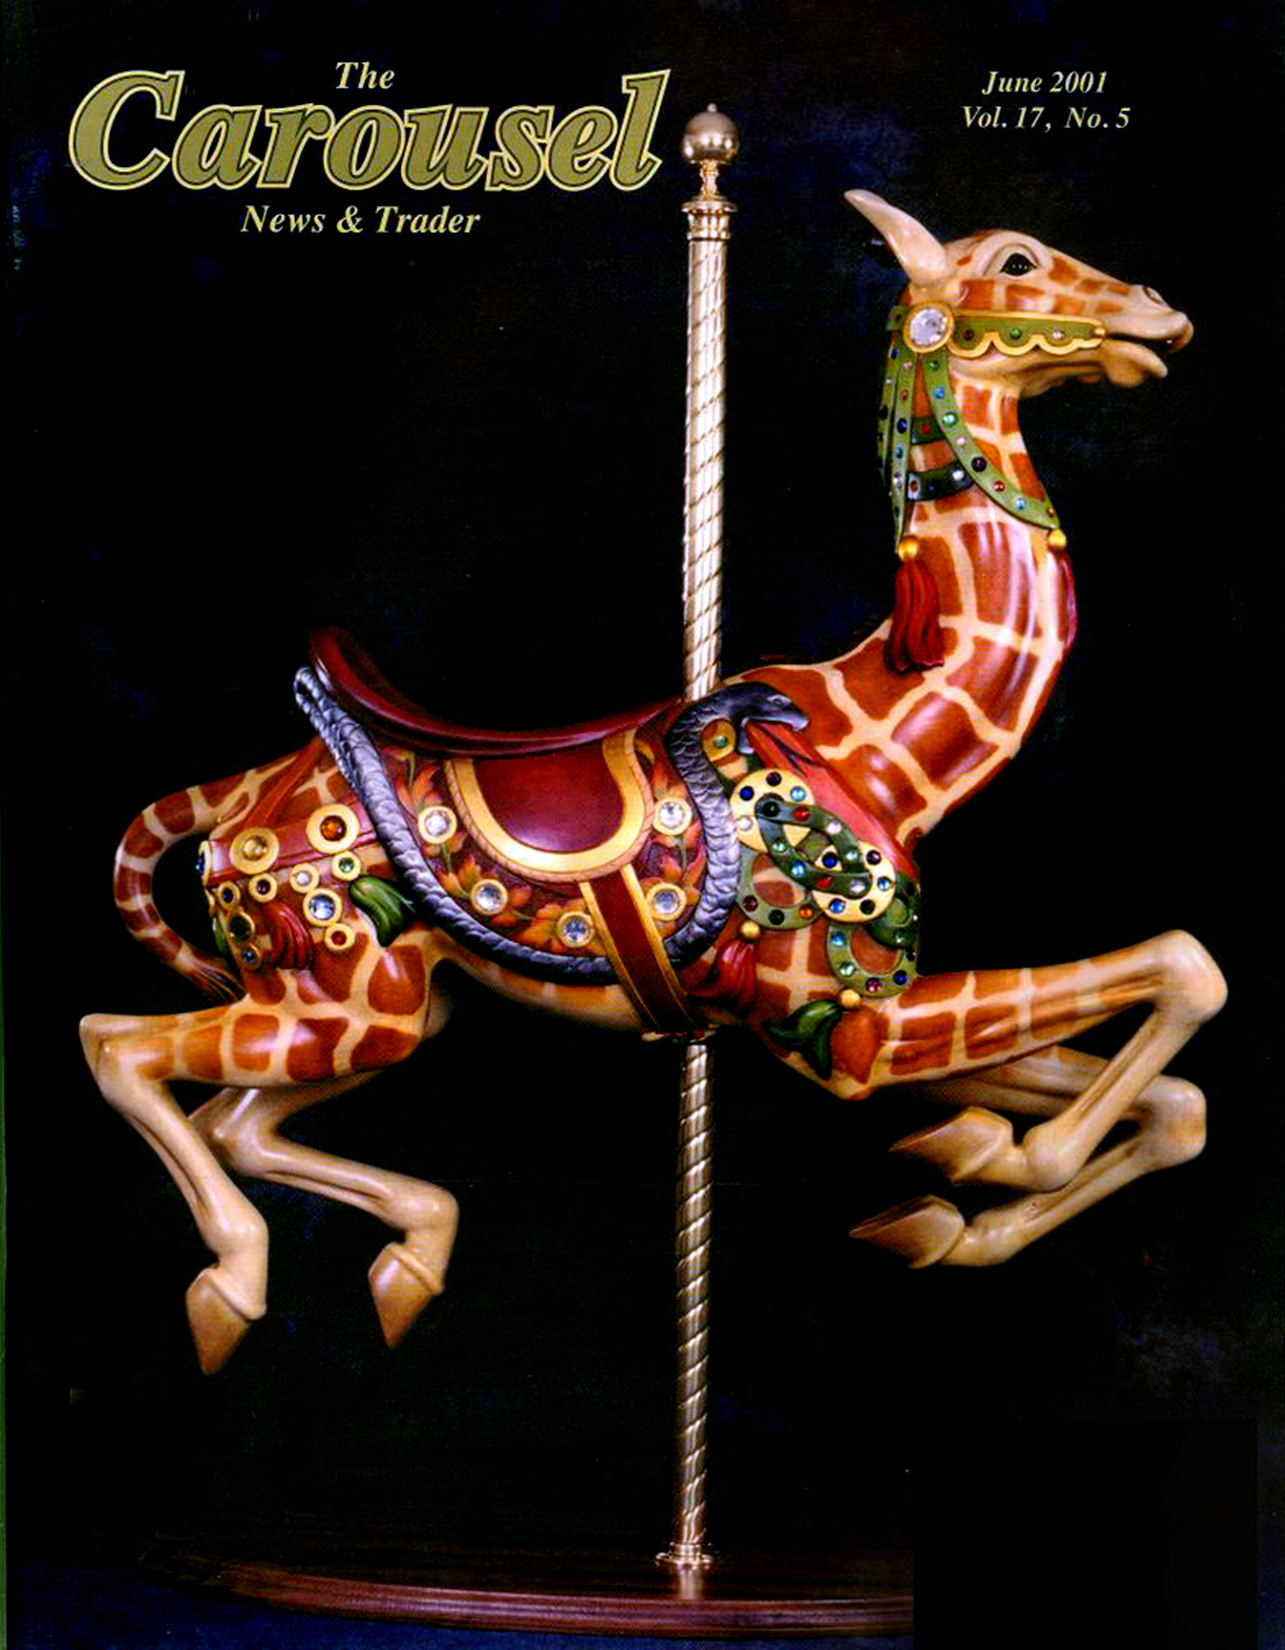 cnt_06_2001-Jewelled-Looff-carousel-giraffe-jumper